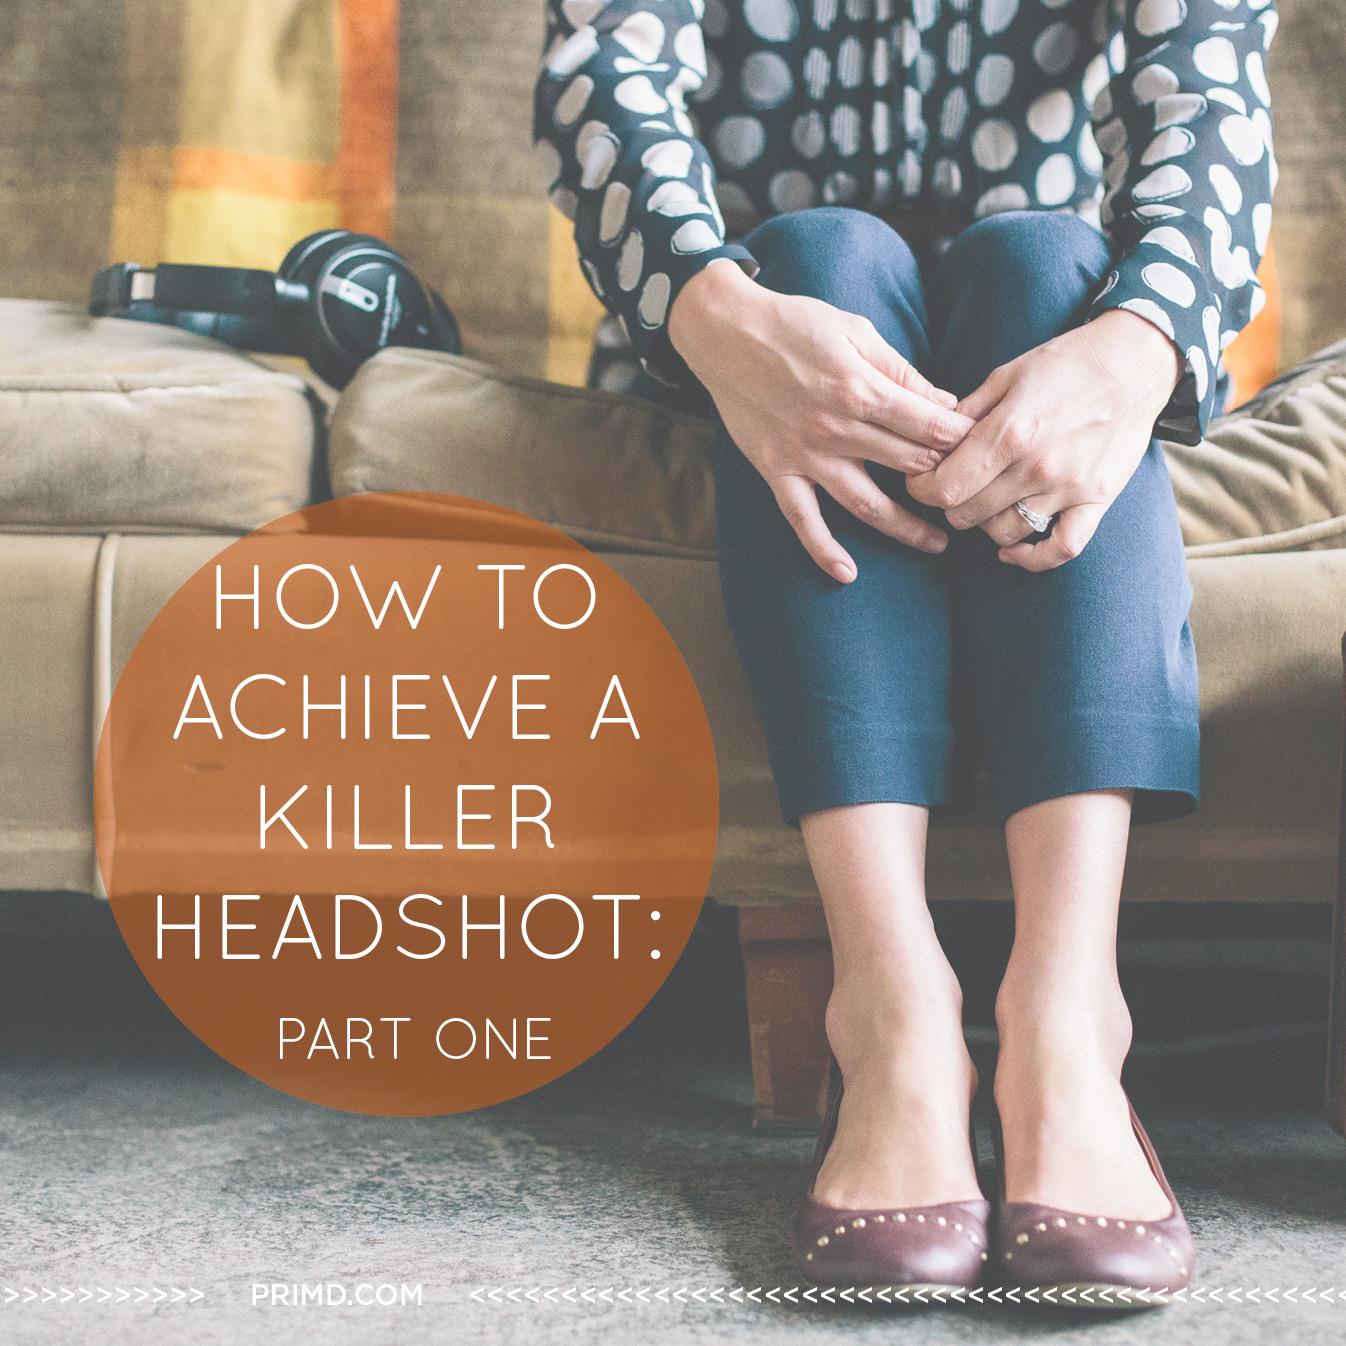 How To Achieve A Killer Headhot: Part 1, Prim'd Marketing blog